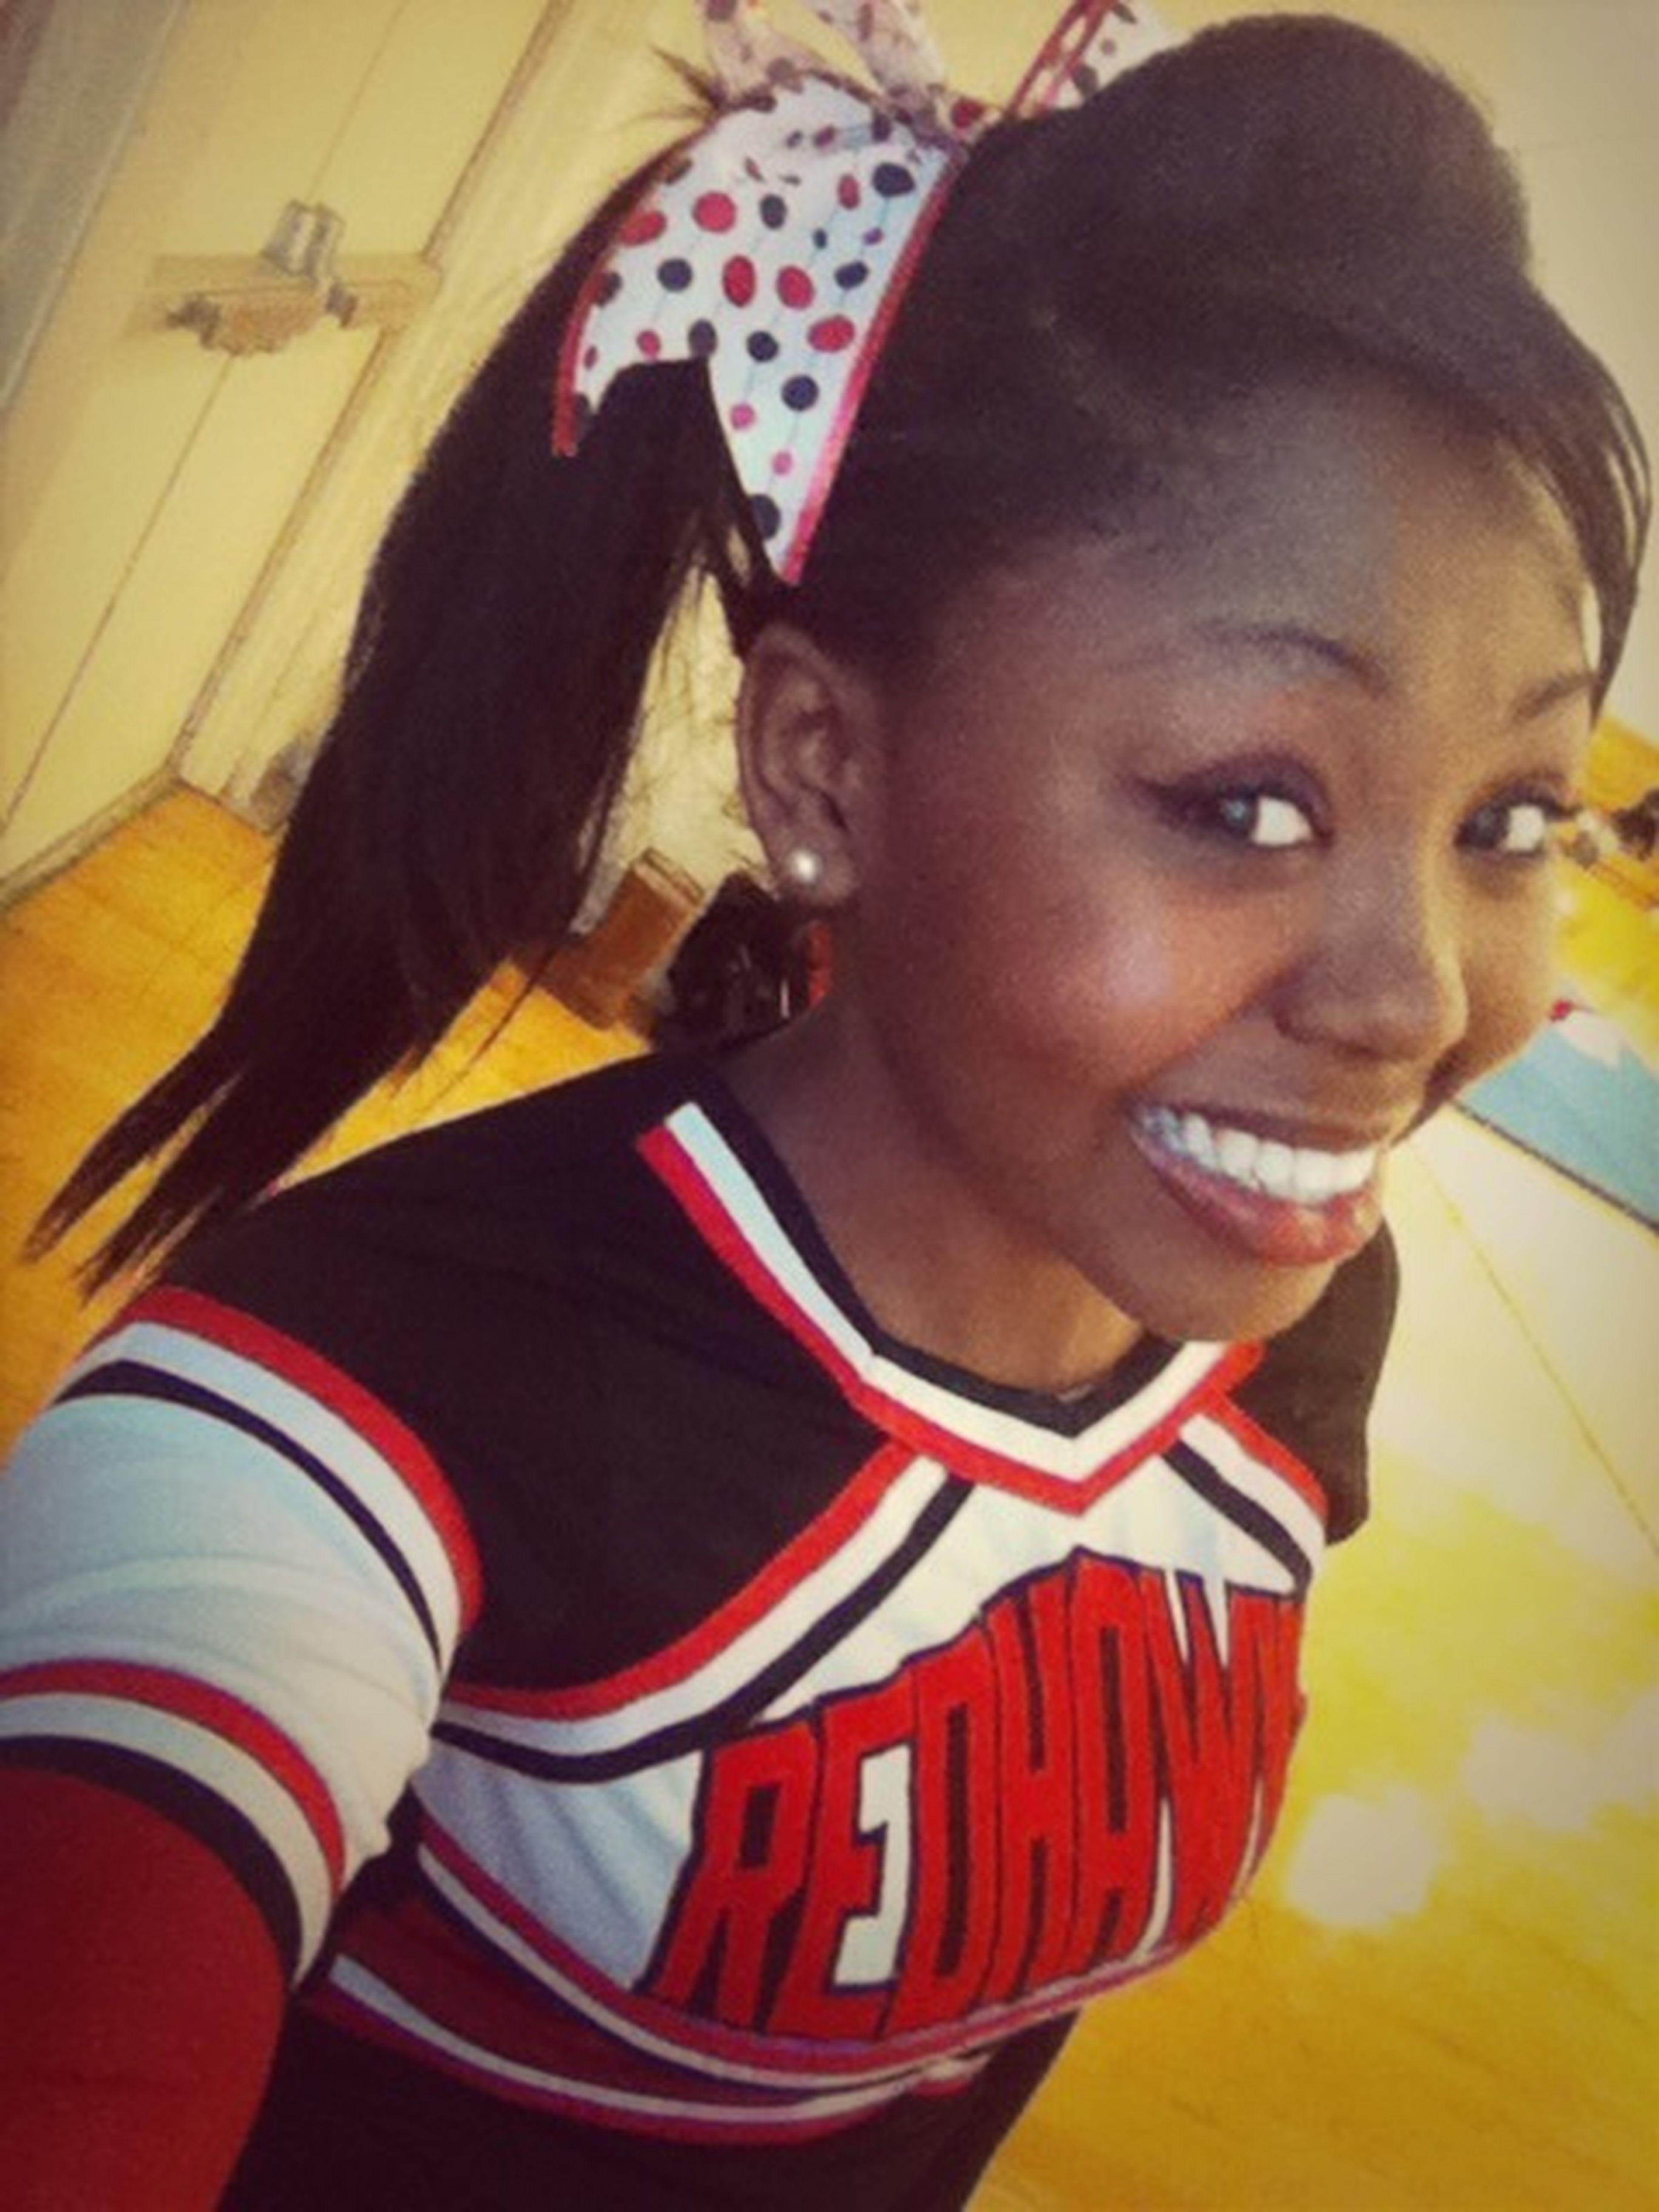 Cheerleading, I miss this :(